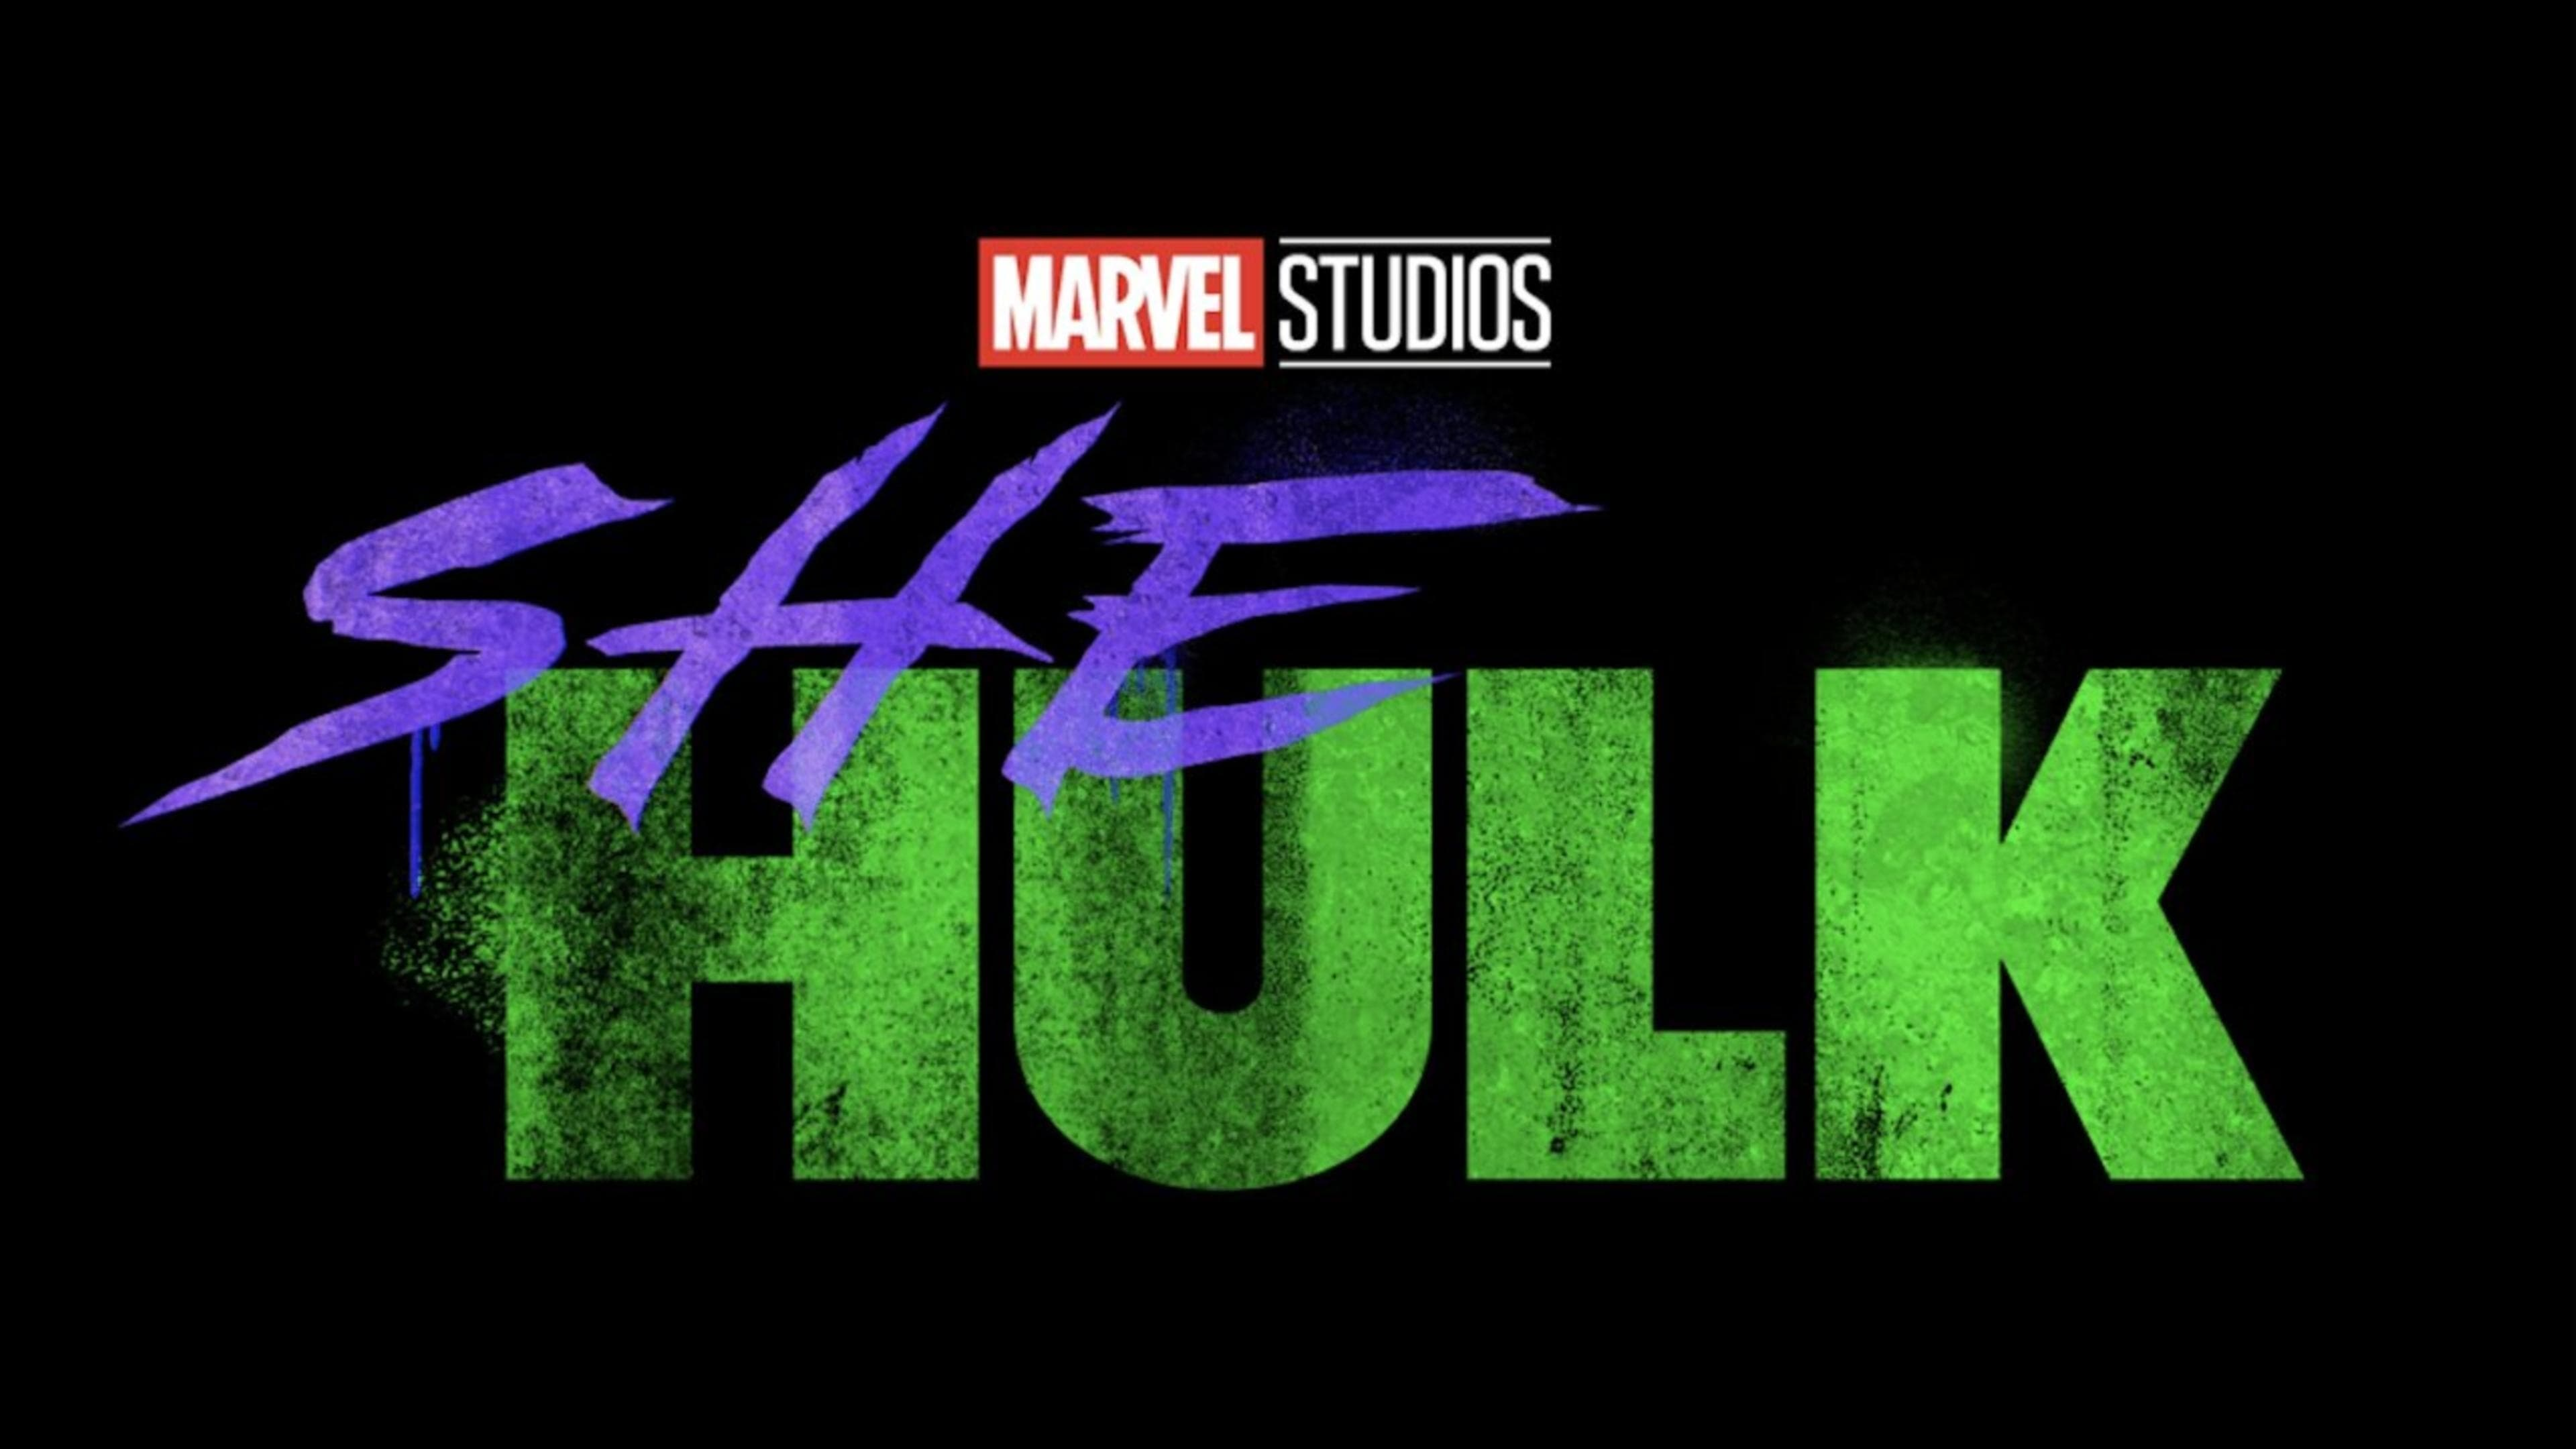 Titelrol voor Orphan Black actrice Tatiana Maslany in Marvel's She-Hulk